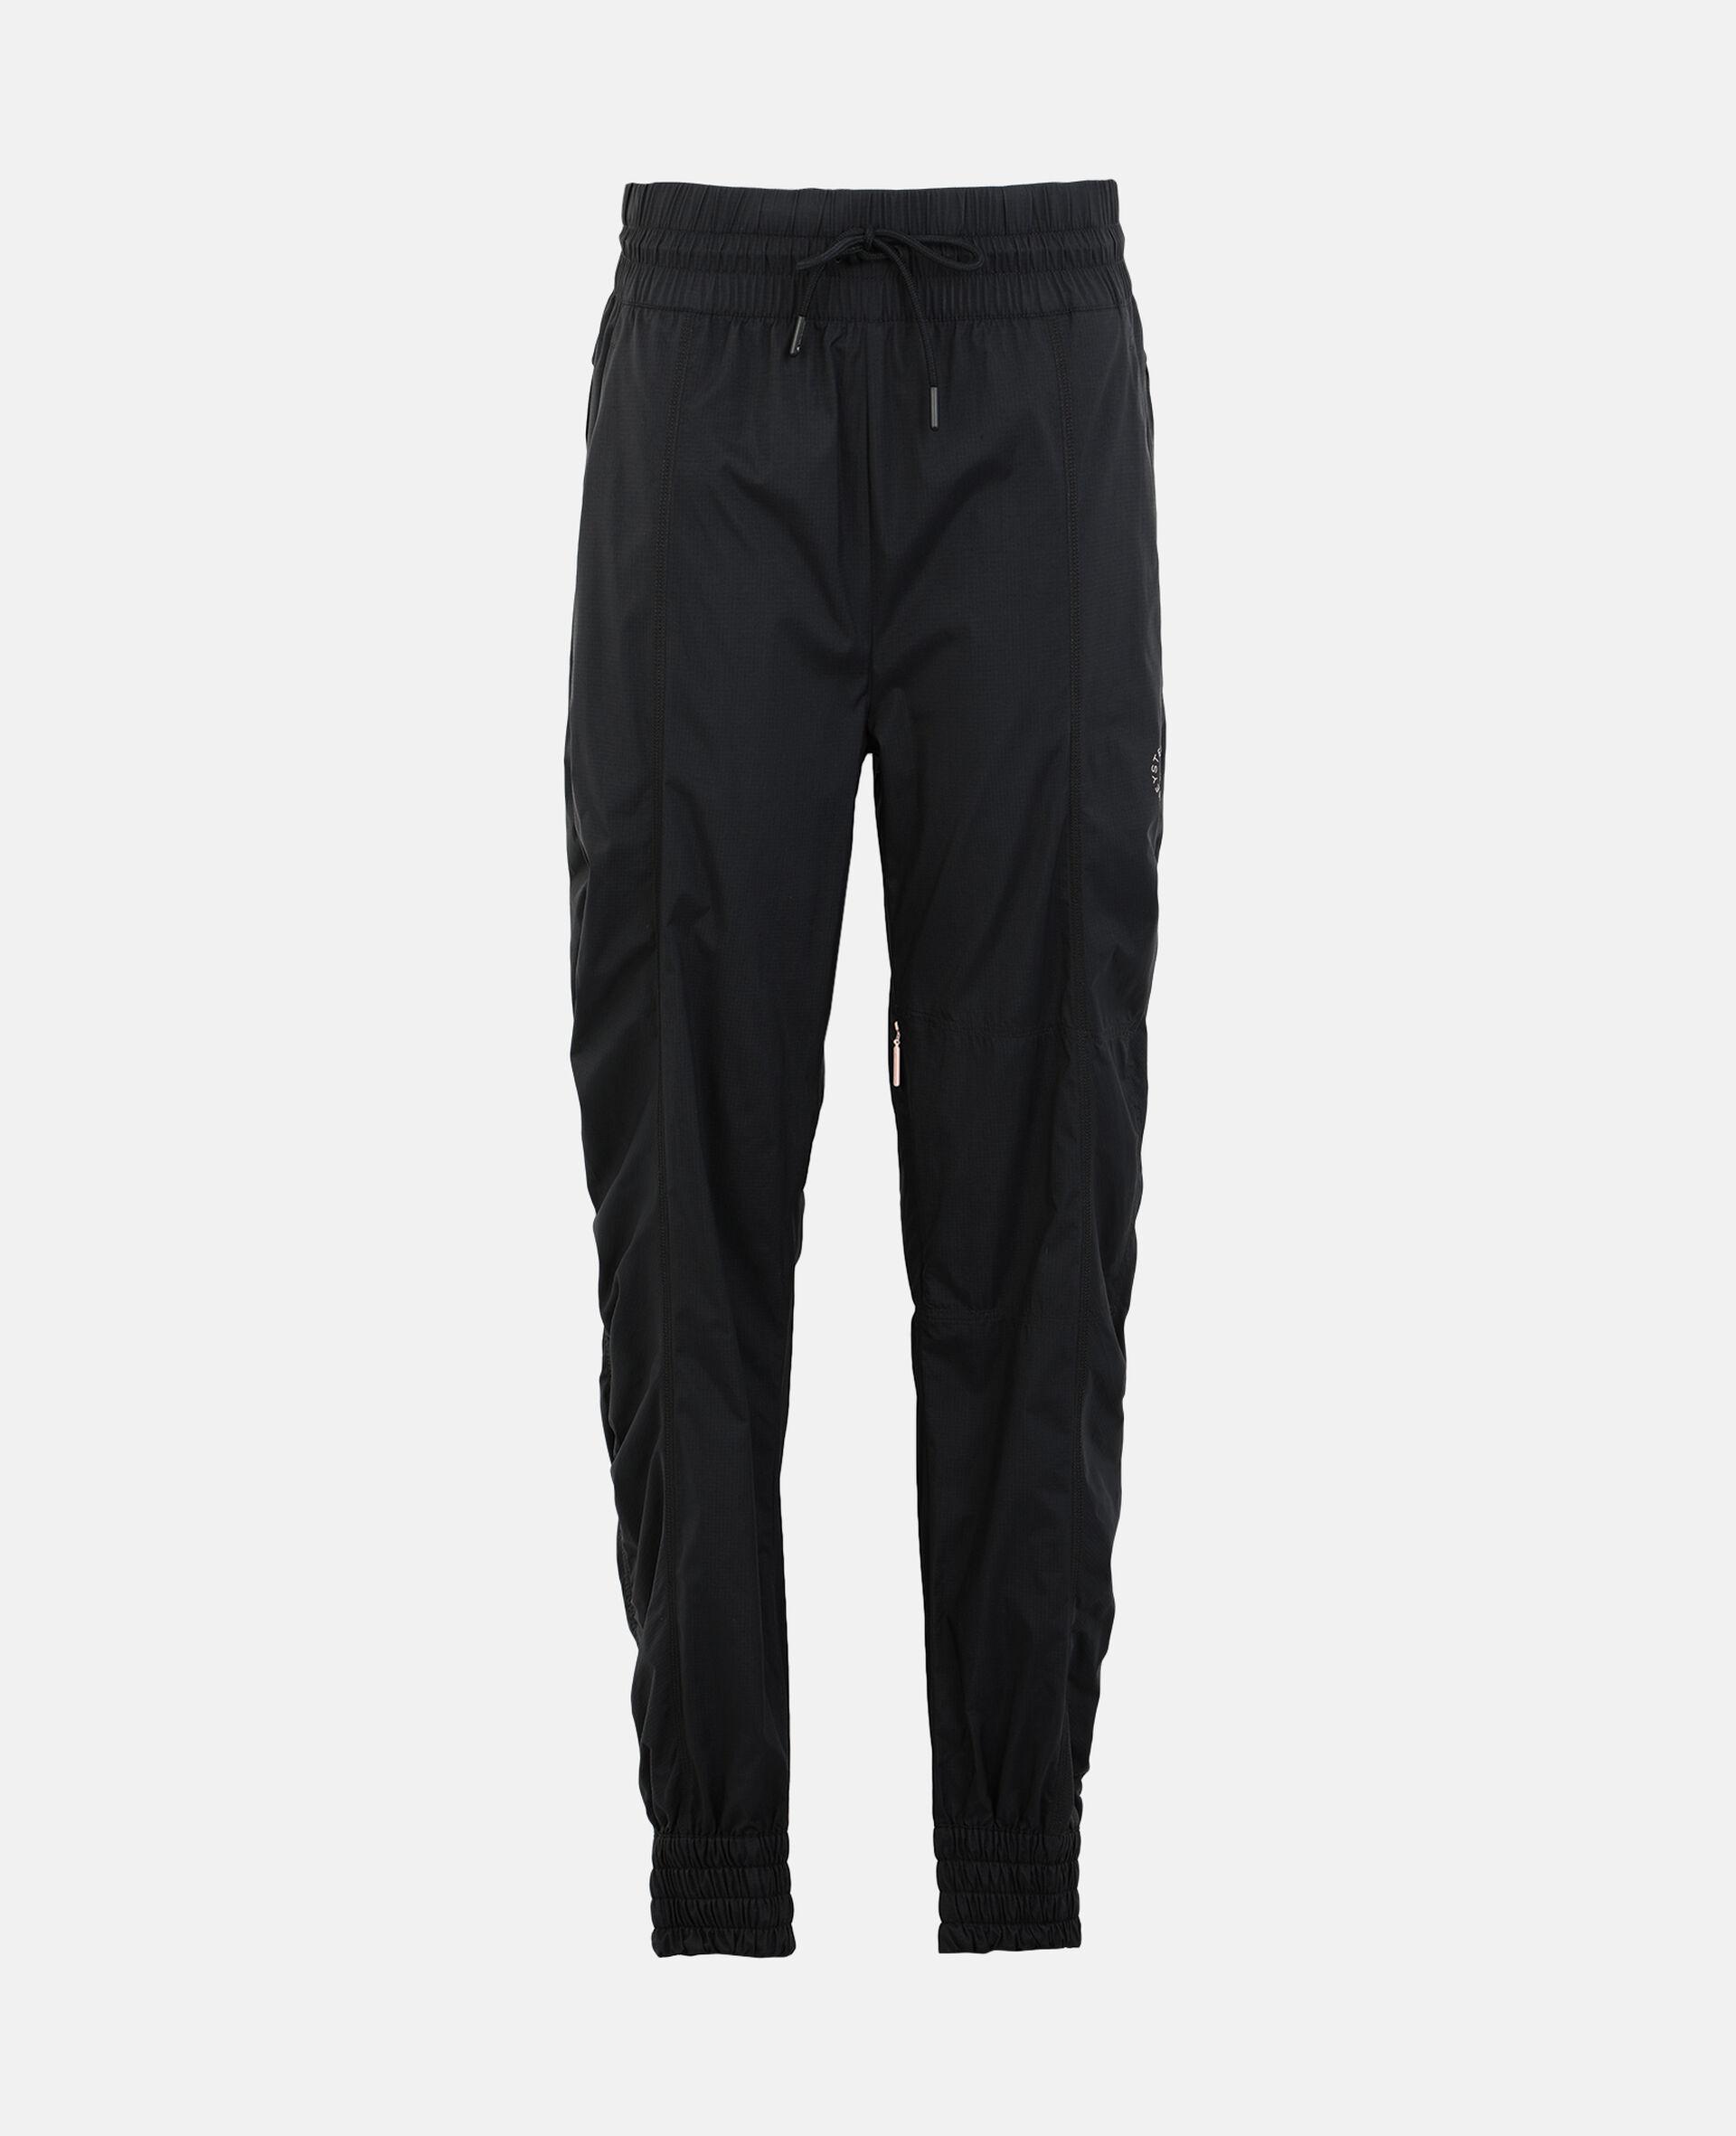 Black Woven Training Pants-Black-large image number 0